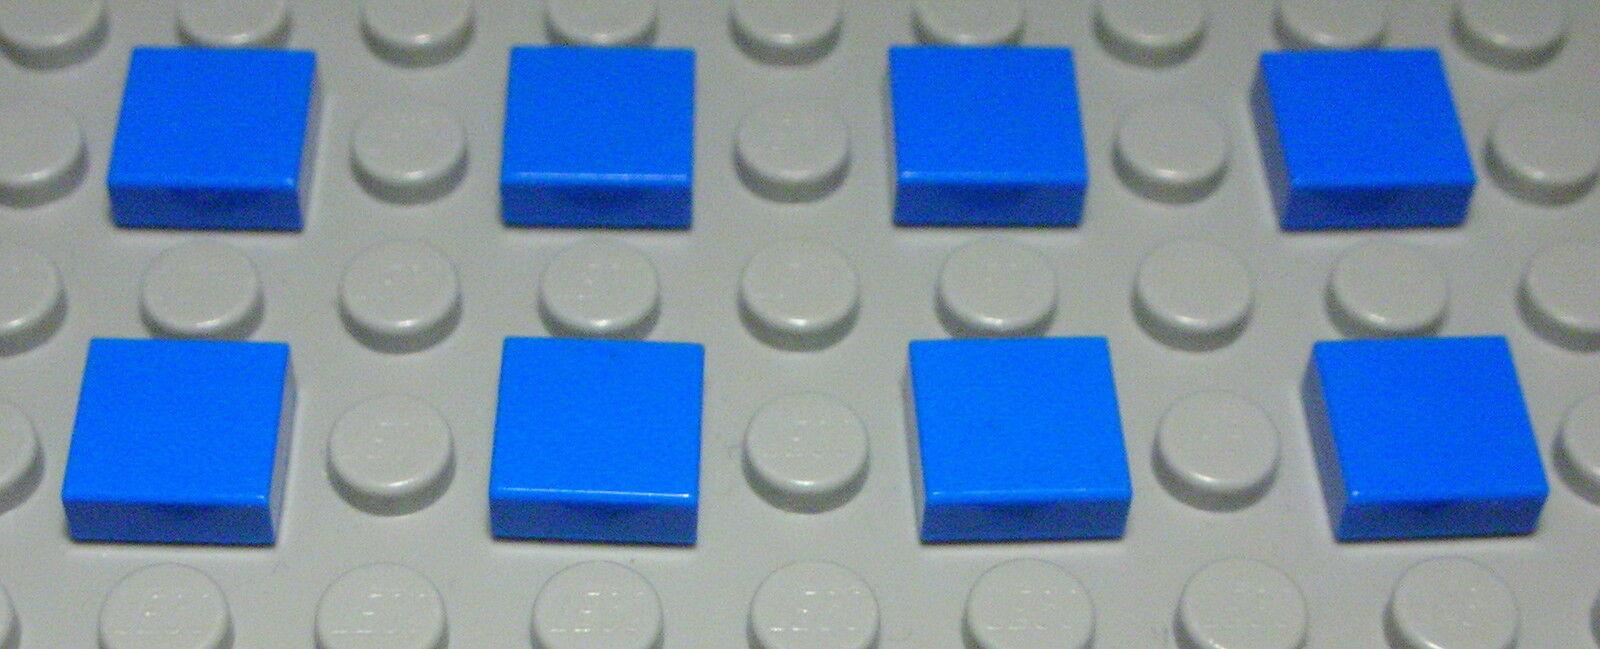 Lego--4162 Fliese-Kachel 1 x 8 Schwarz 4 Stück